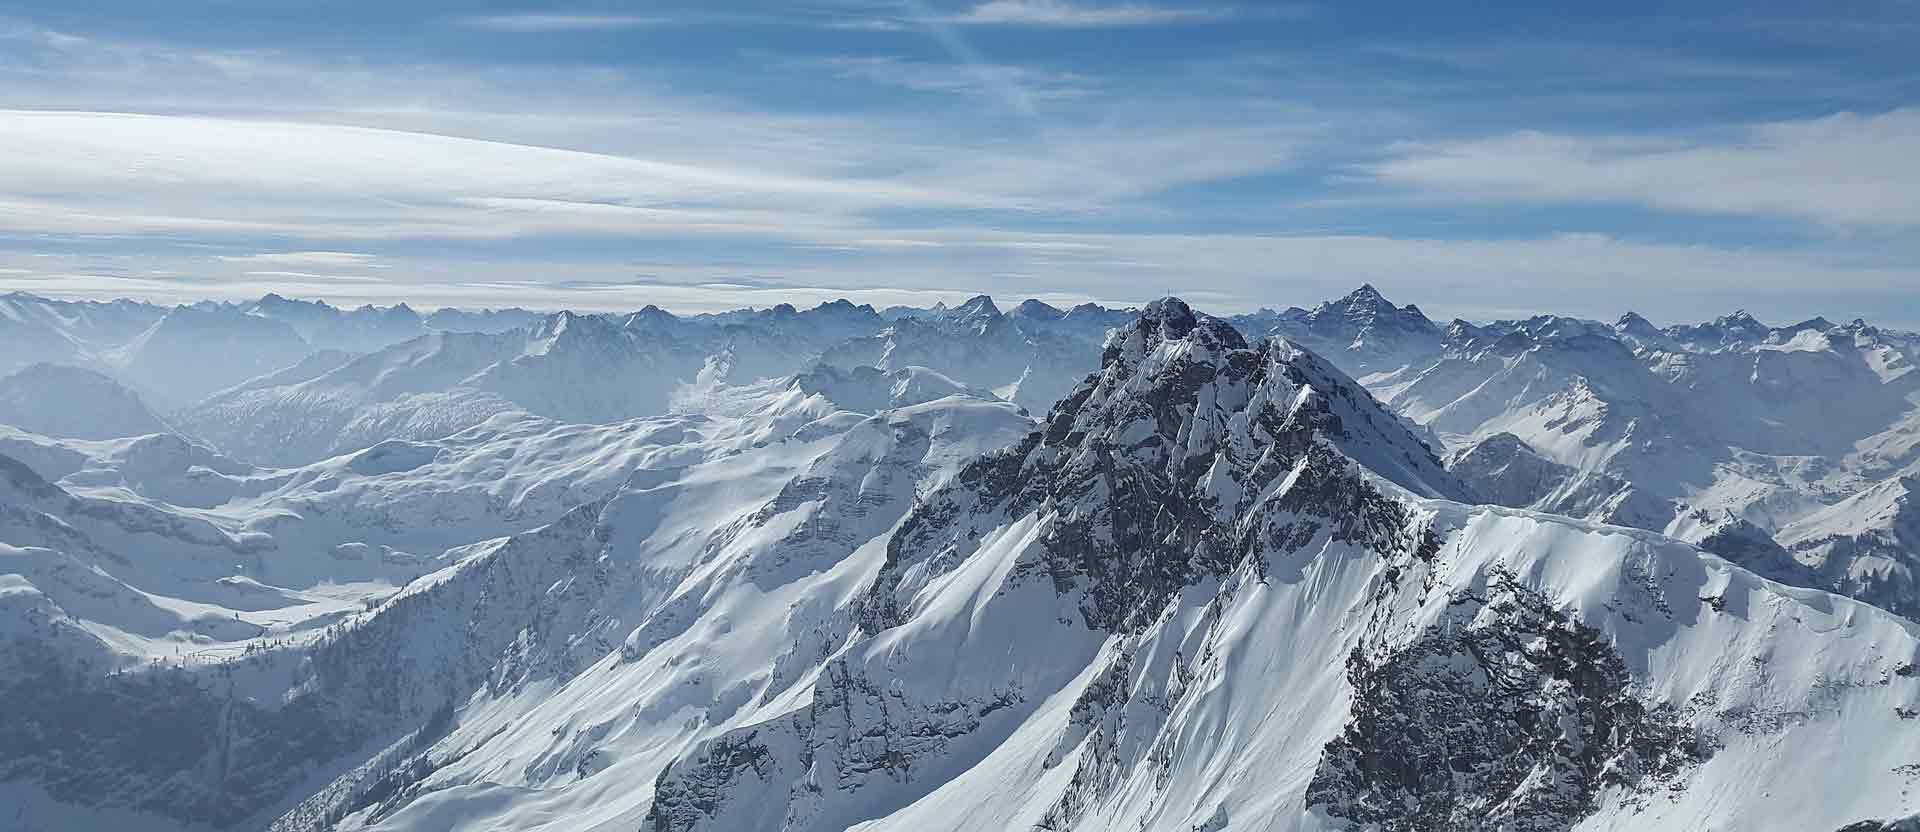 trekkinglife-wandern-im-winter-alpen